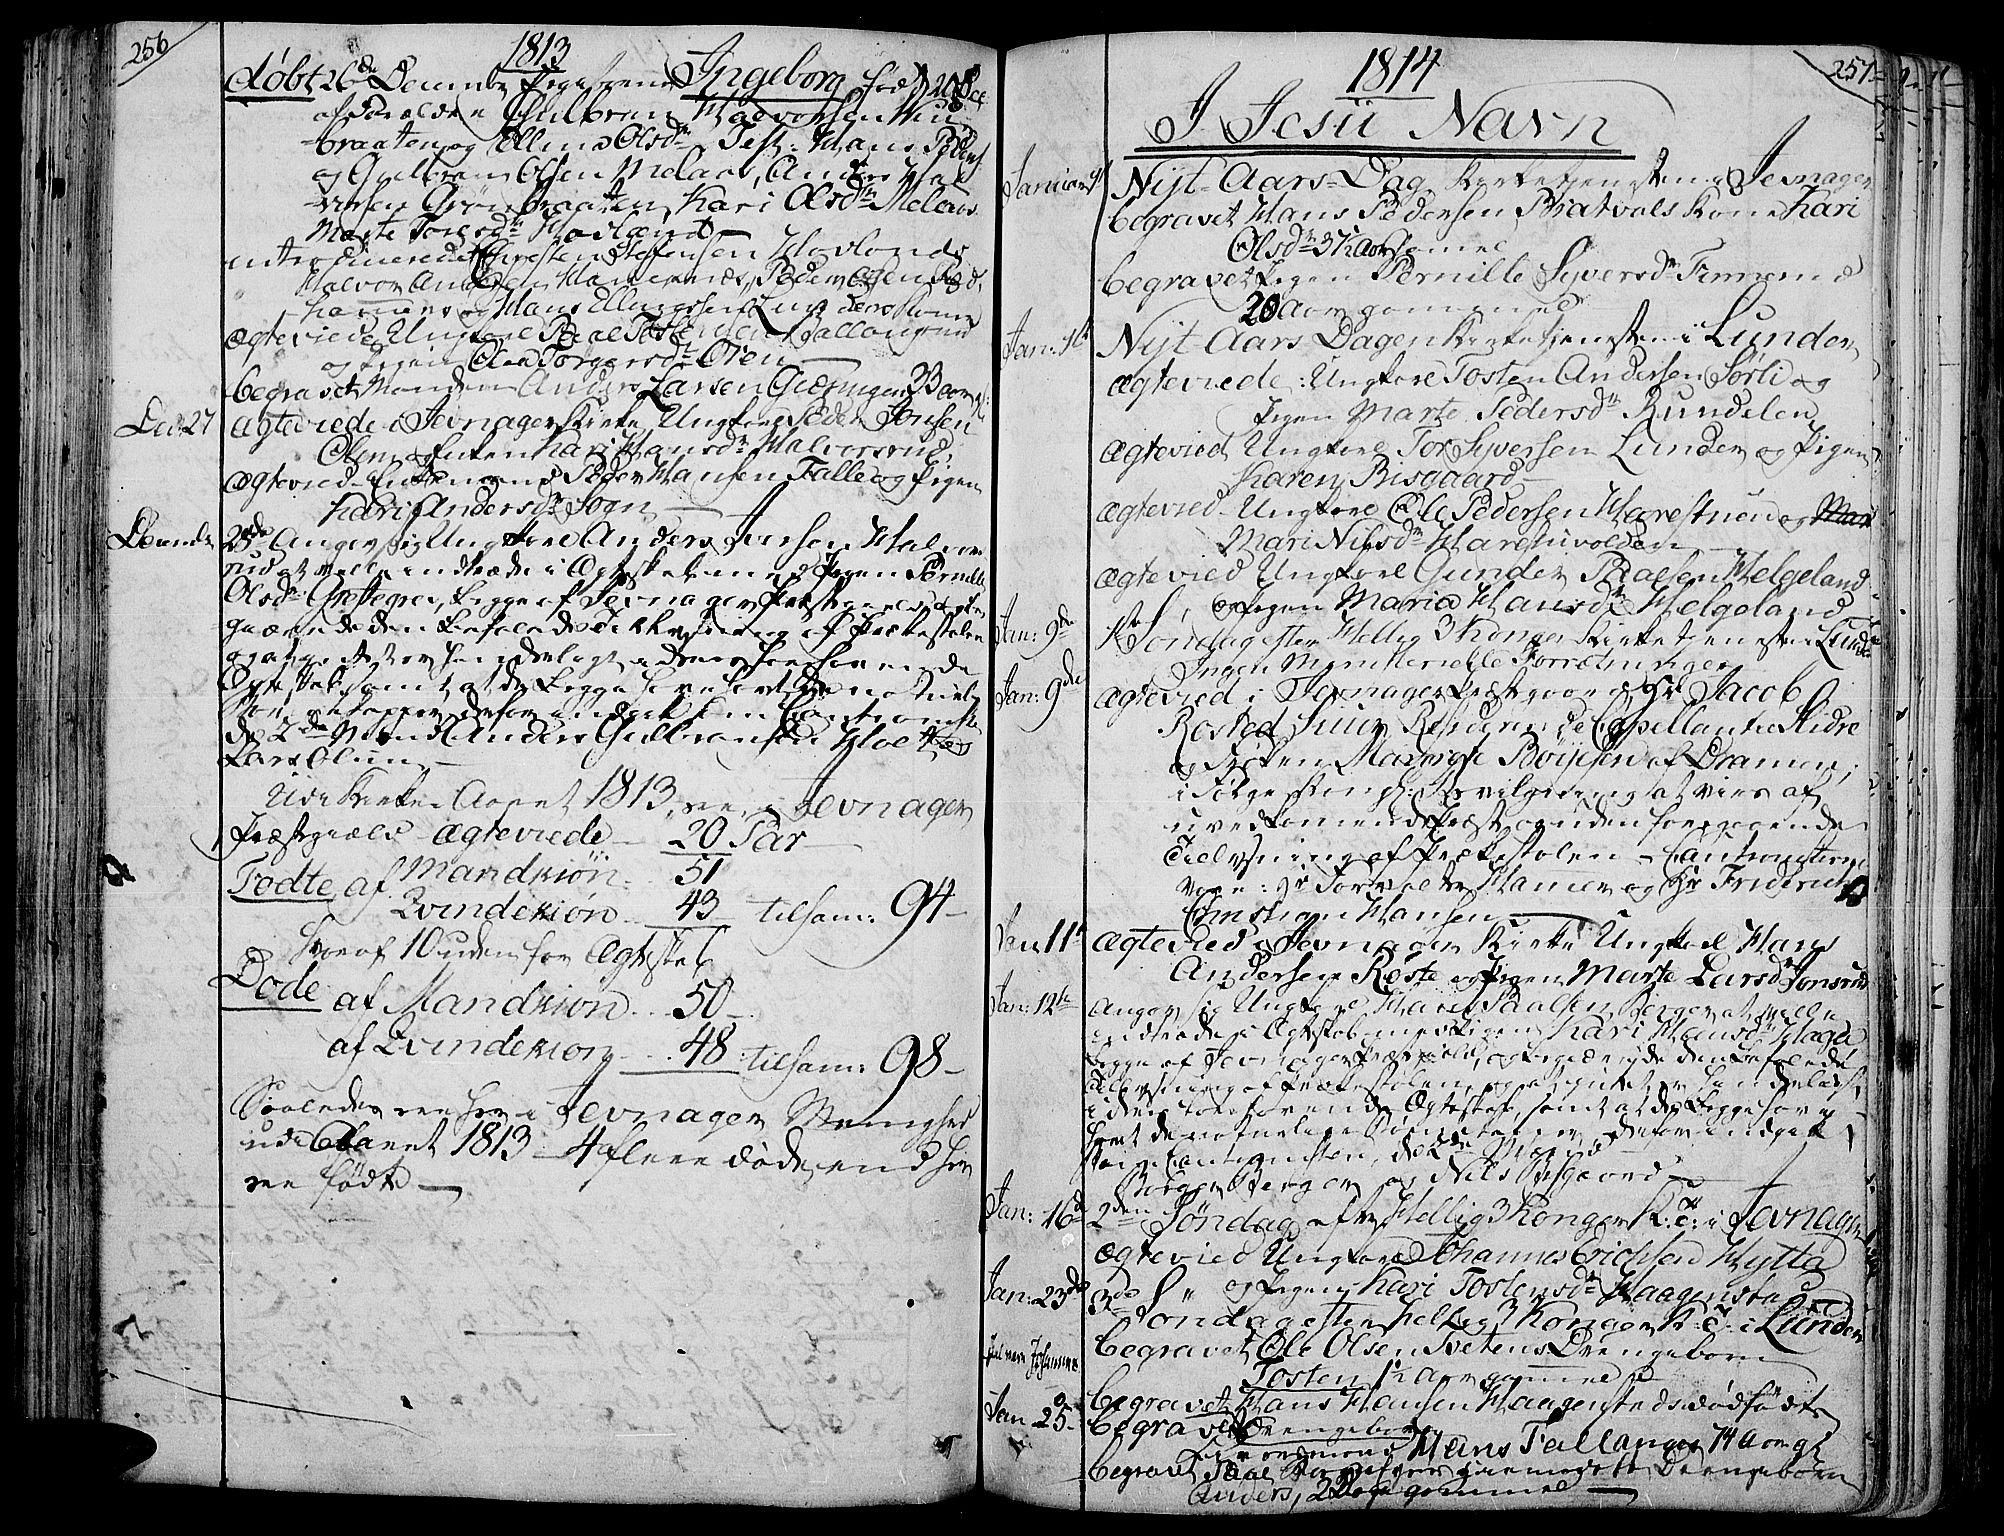 SAH, Jevnaker prestekontor, Ministerialbok nr. 4, 1800-1861, s. 256-257